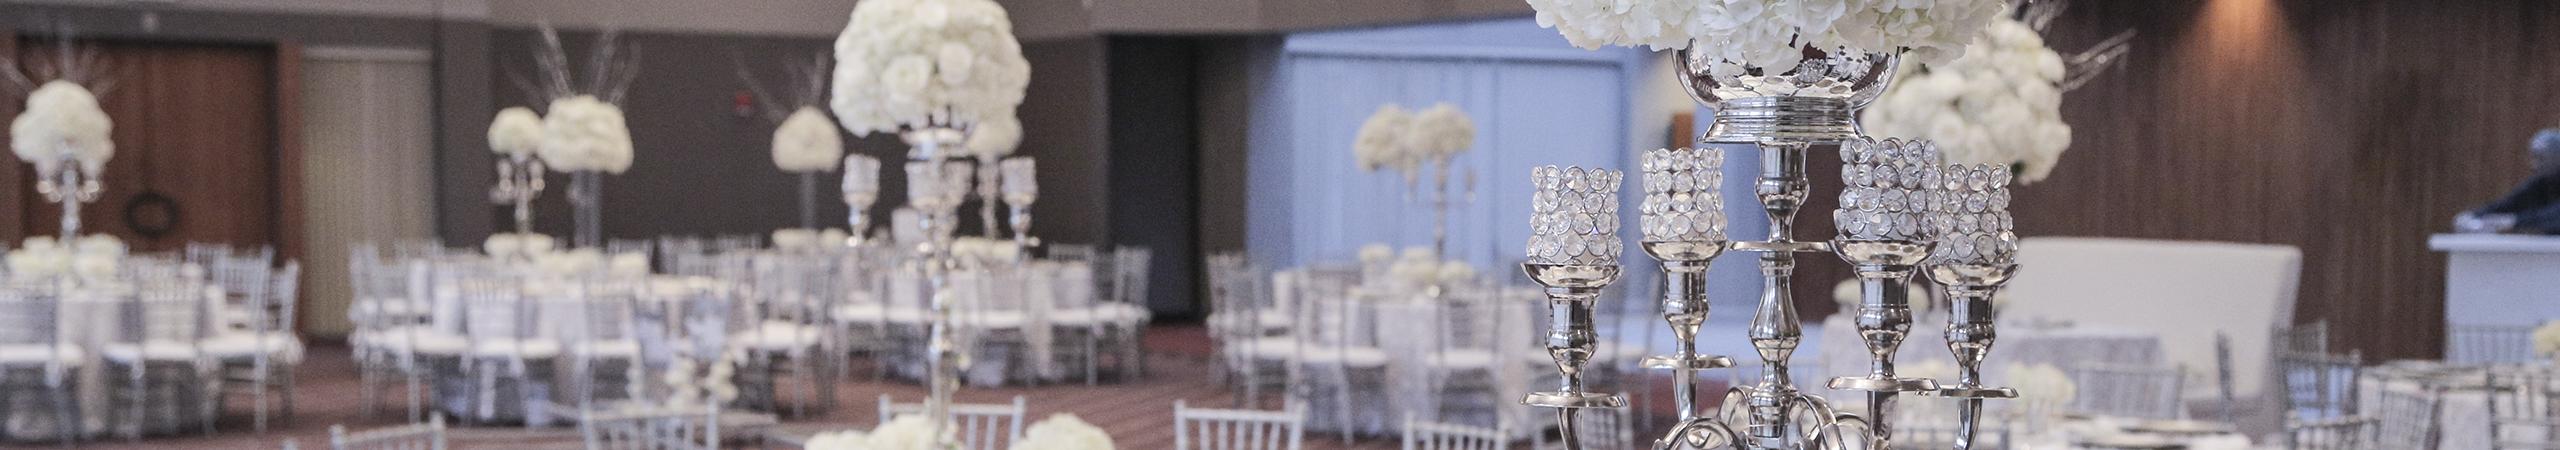 Jacksonville Jewish Center Wedding